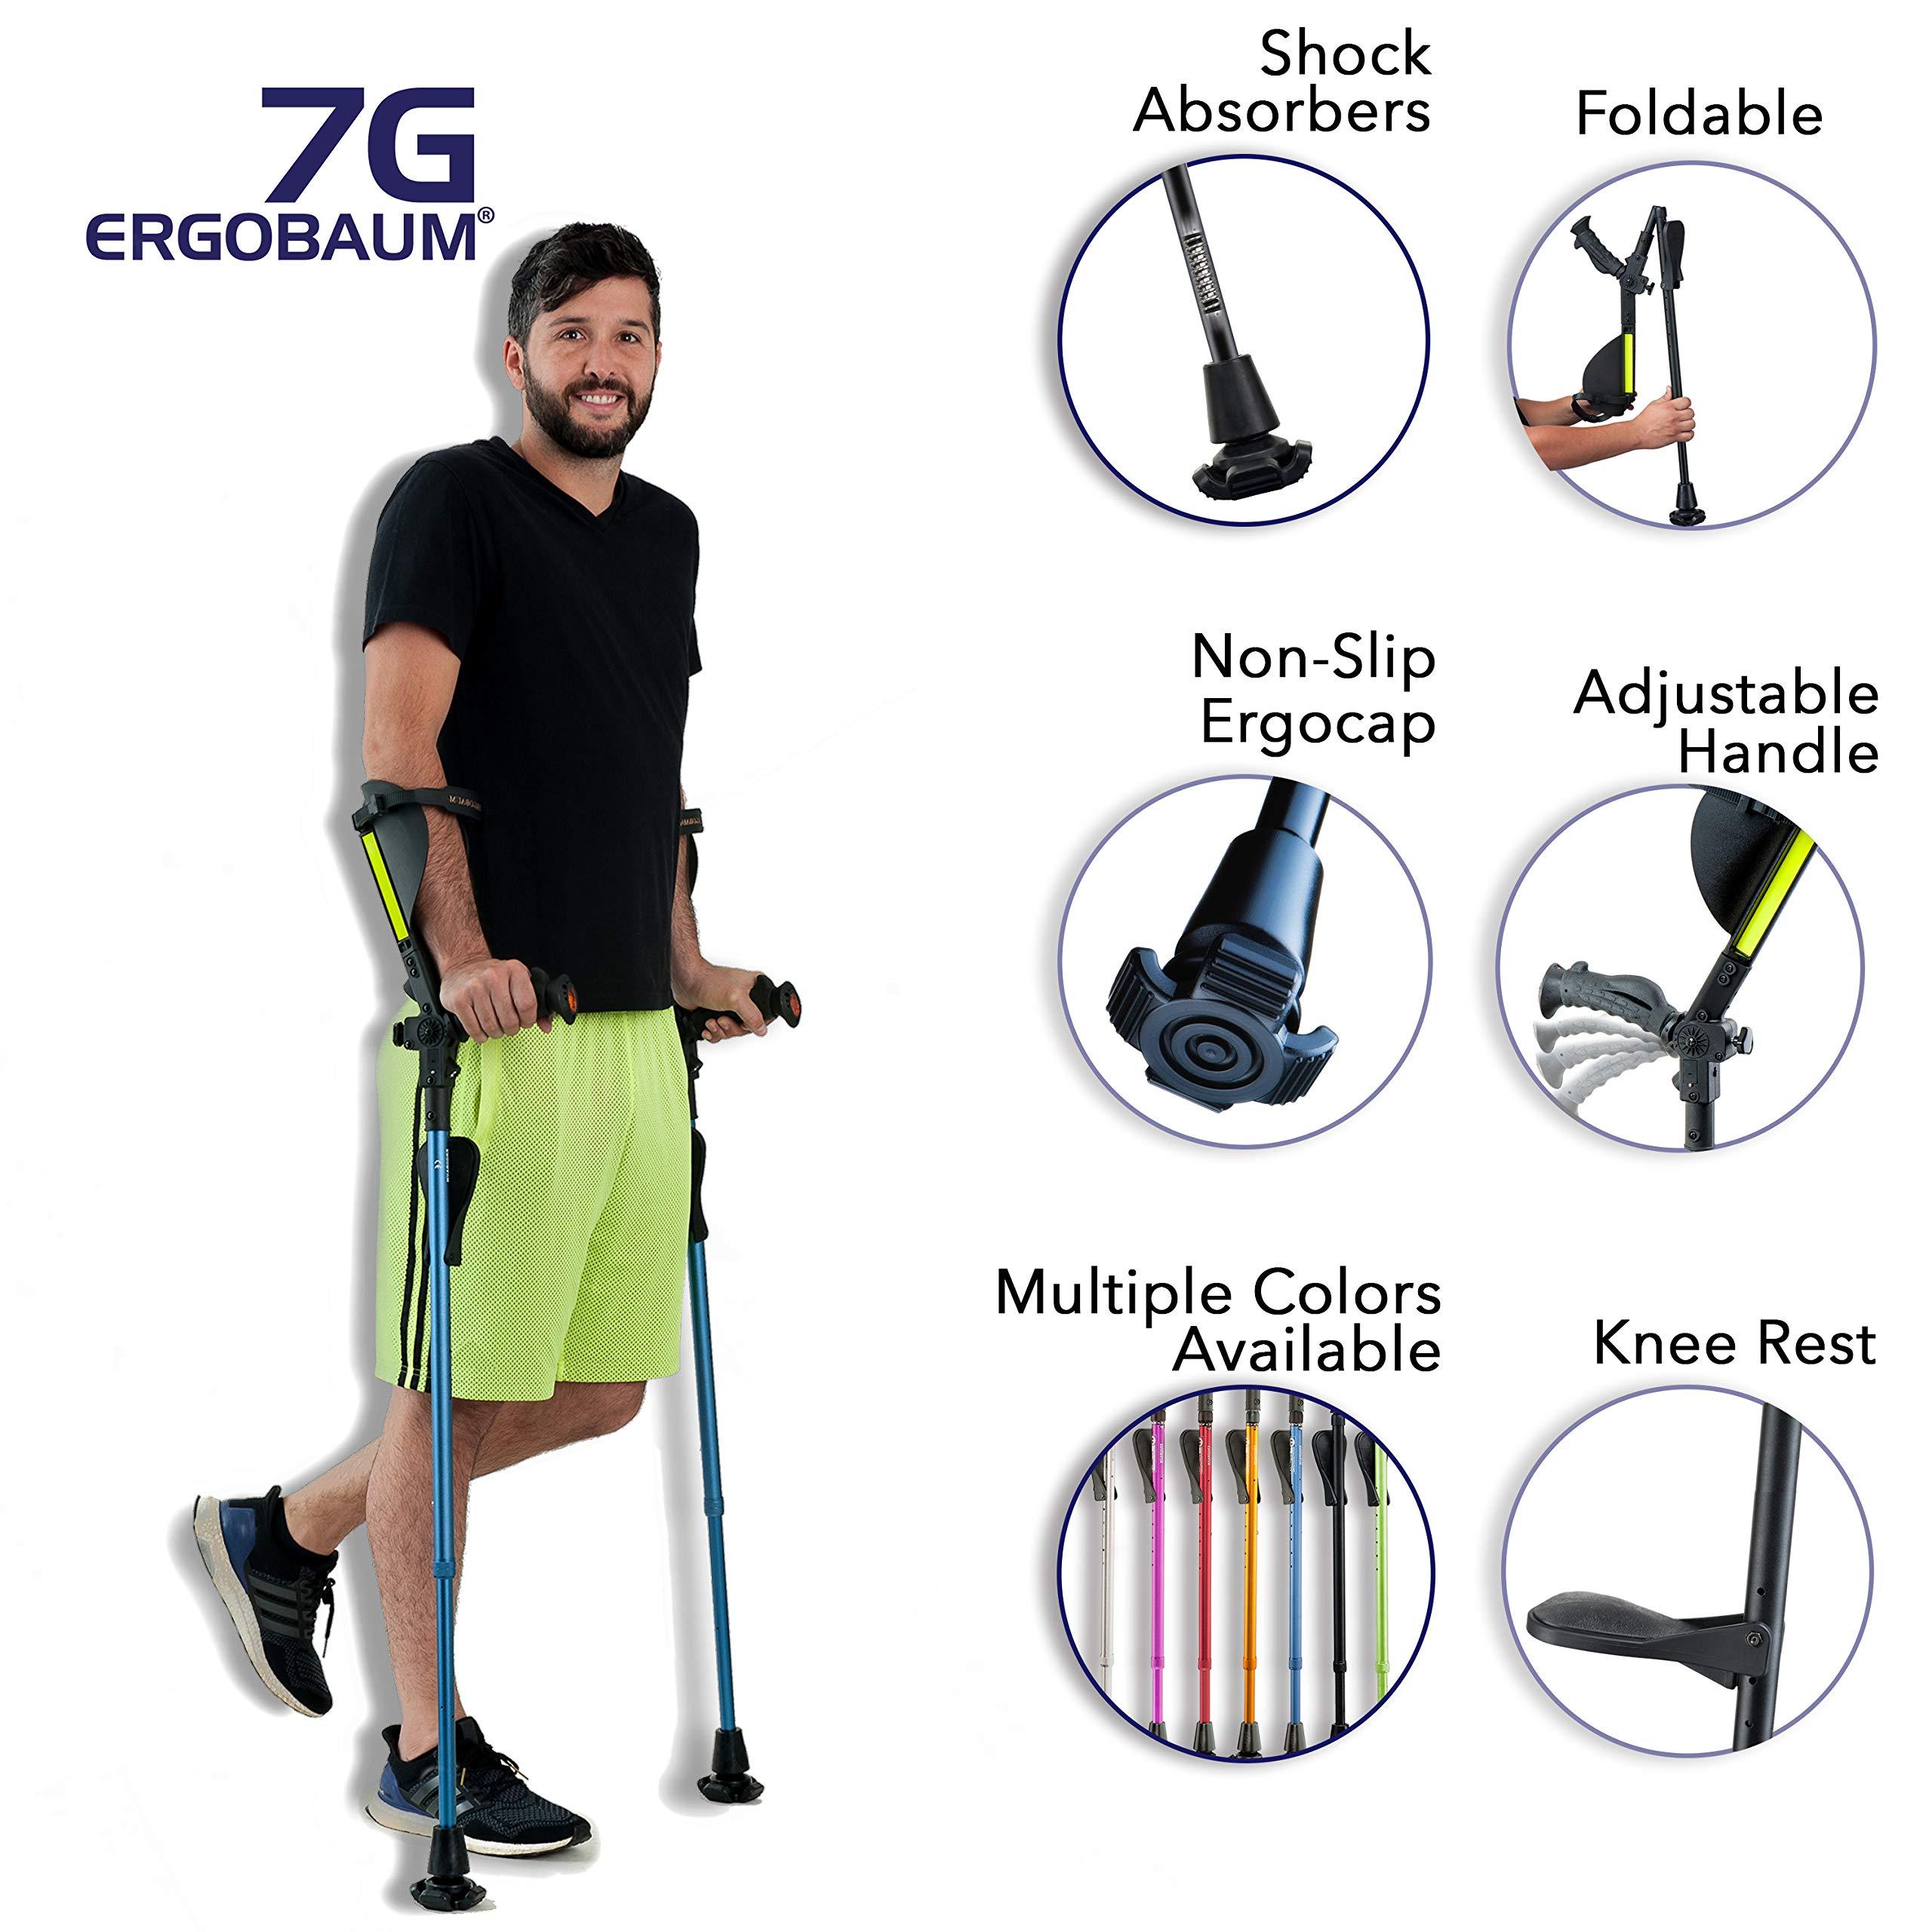 Ergobaum%C2%A8 Generation Ergoactives Ergonomic Crutches